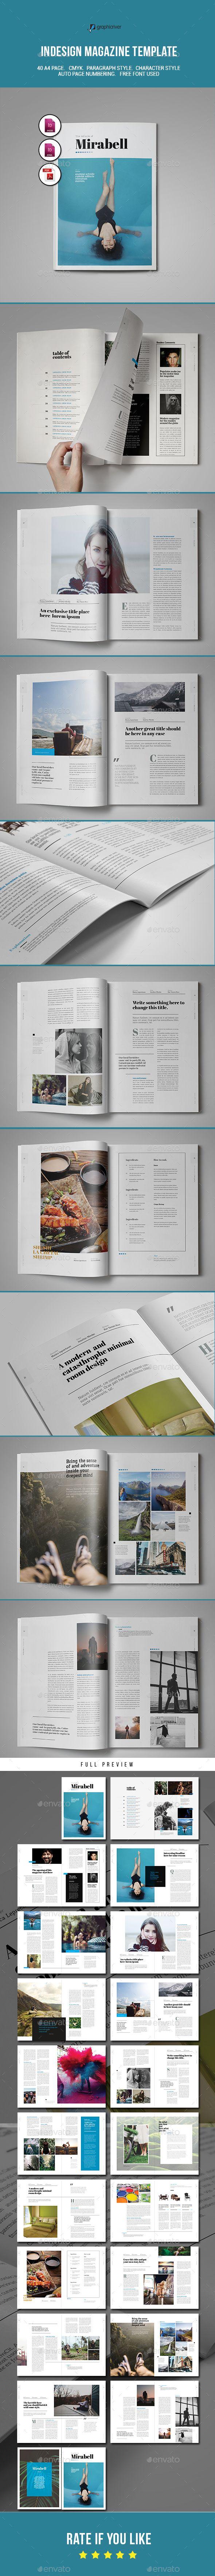 Indesign Magazine Template - #Magazines Print Templates